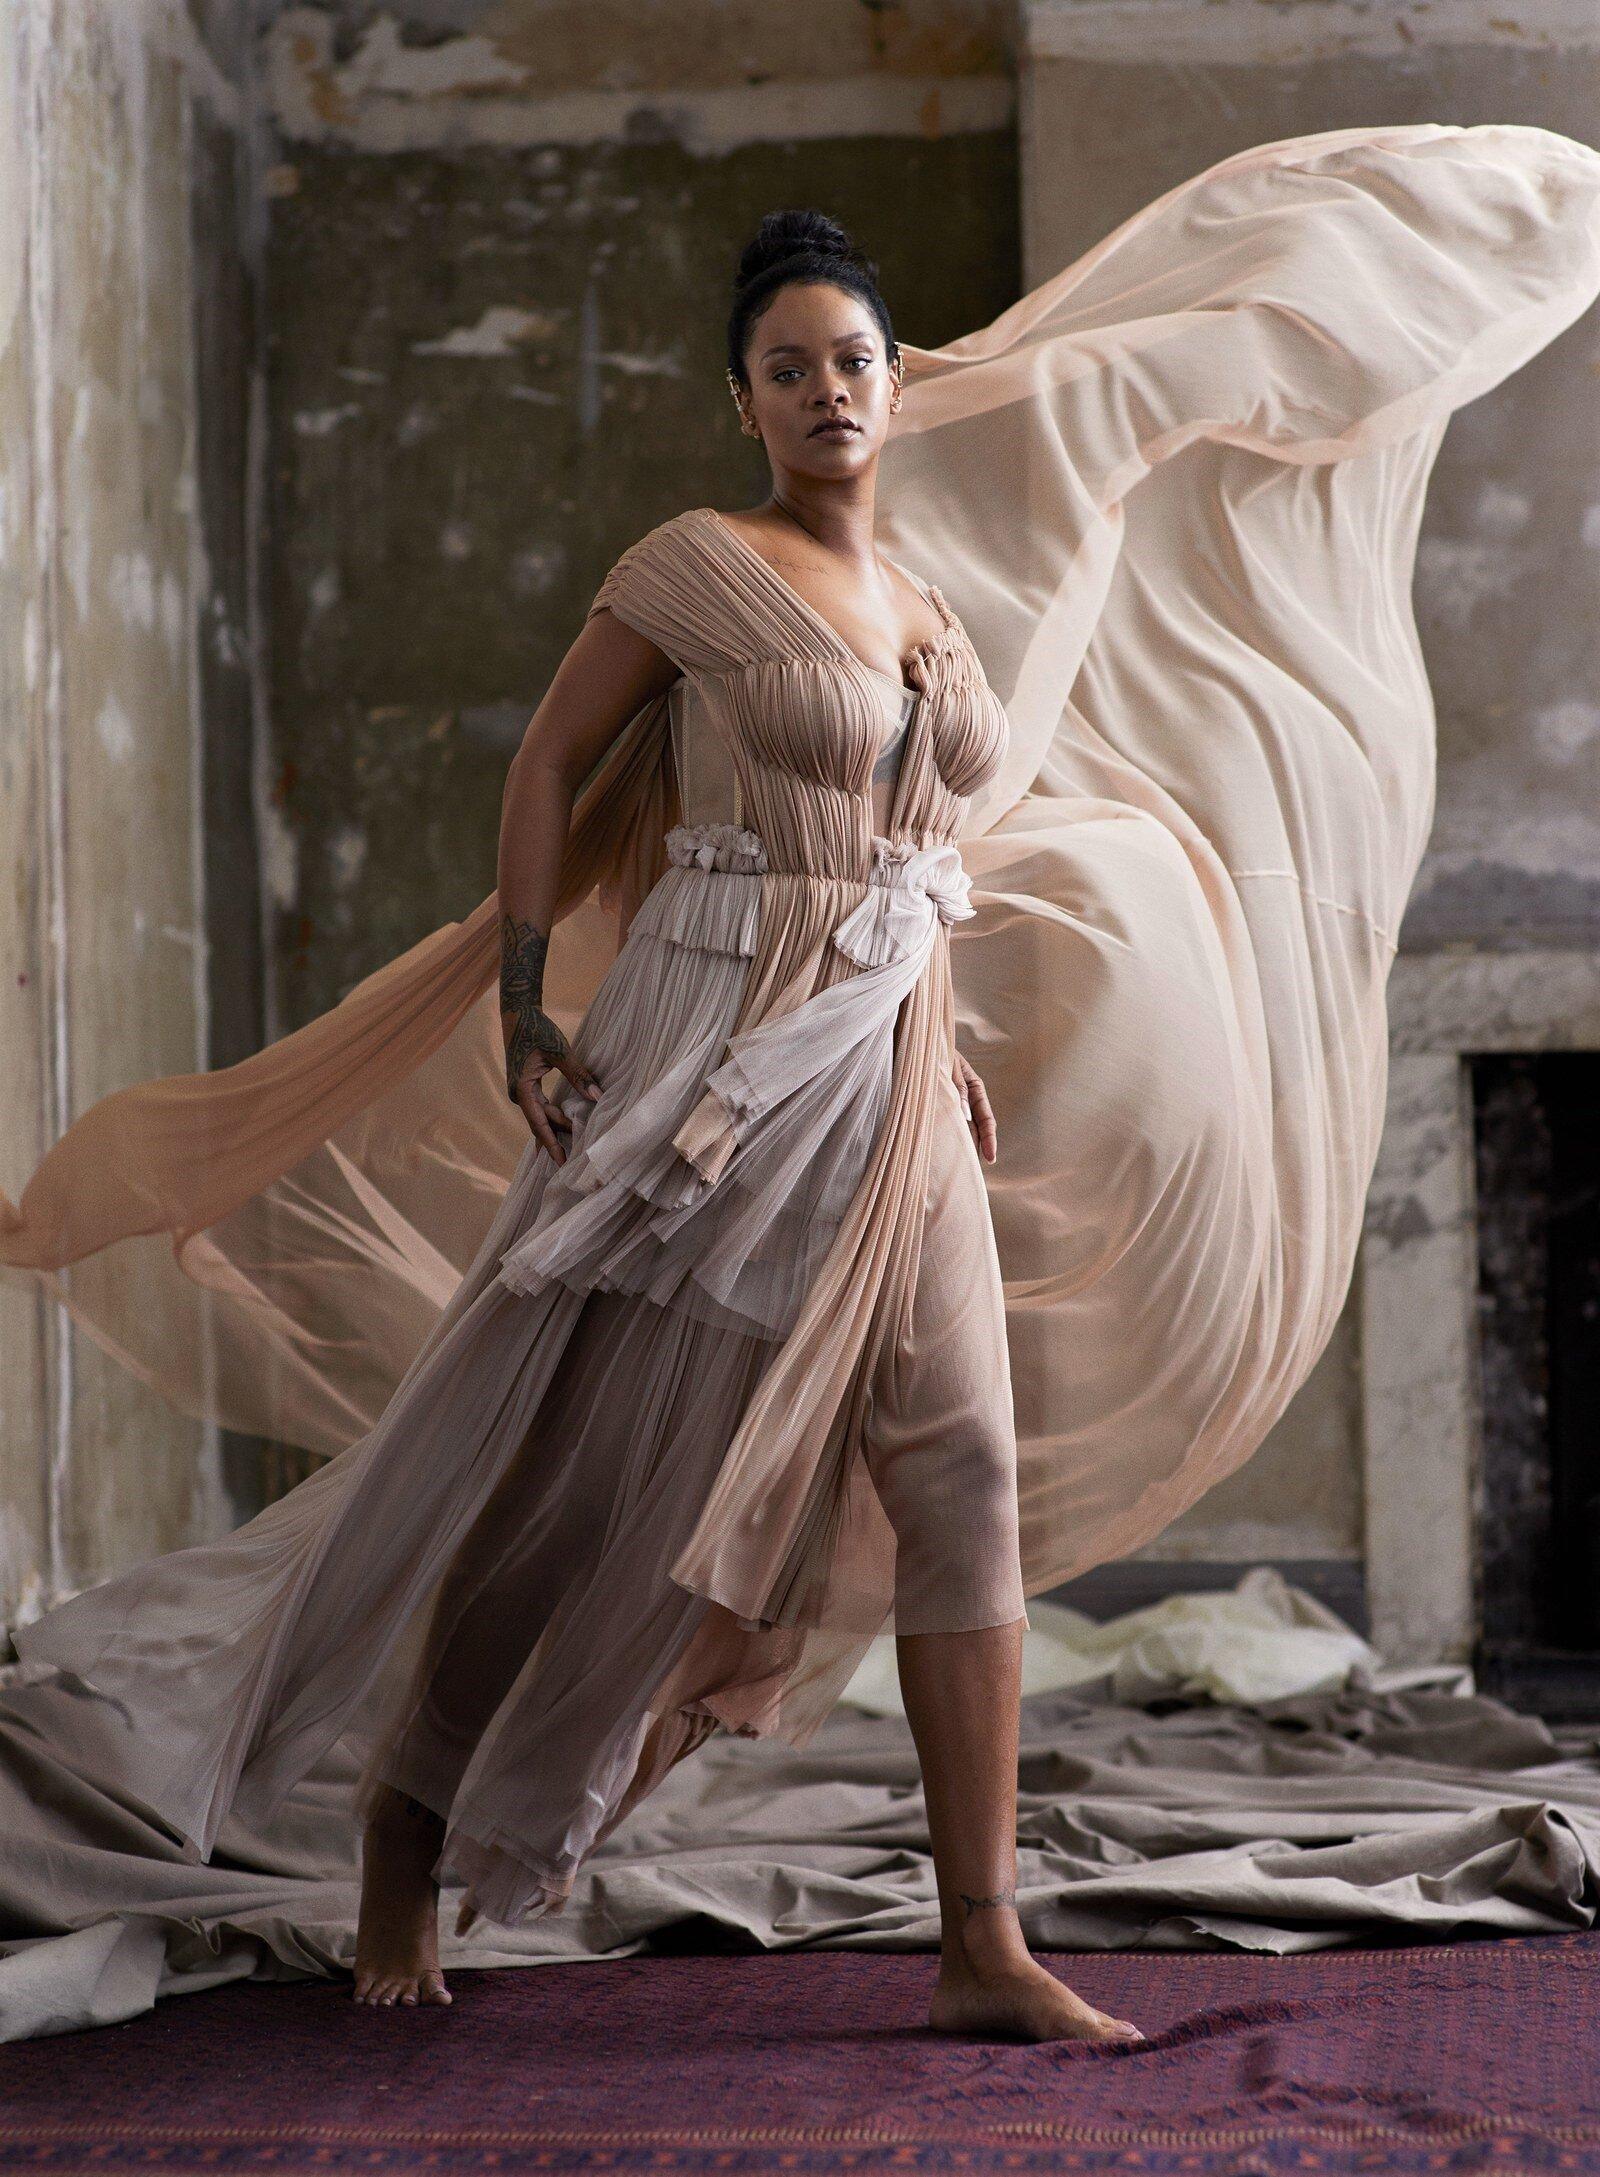 Rihanna-Ethan-James-Green-Vogue US-Nov-2019 (1).jpg